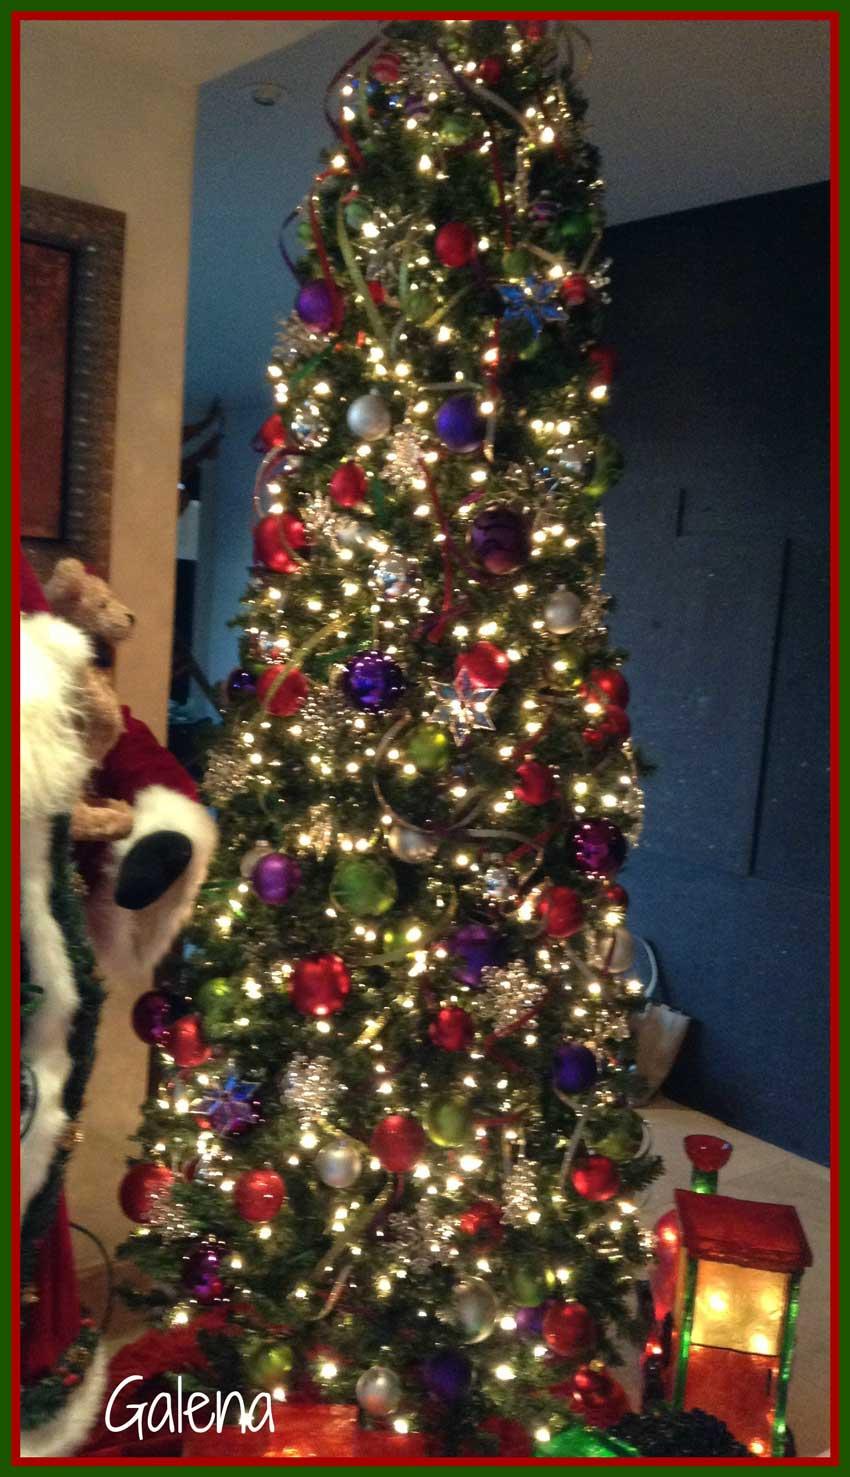 Decoraci n navide a moderna y elegante ana galena - Decoracion navidad moderna ...